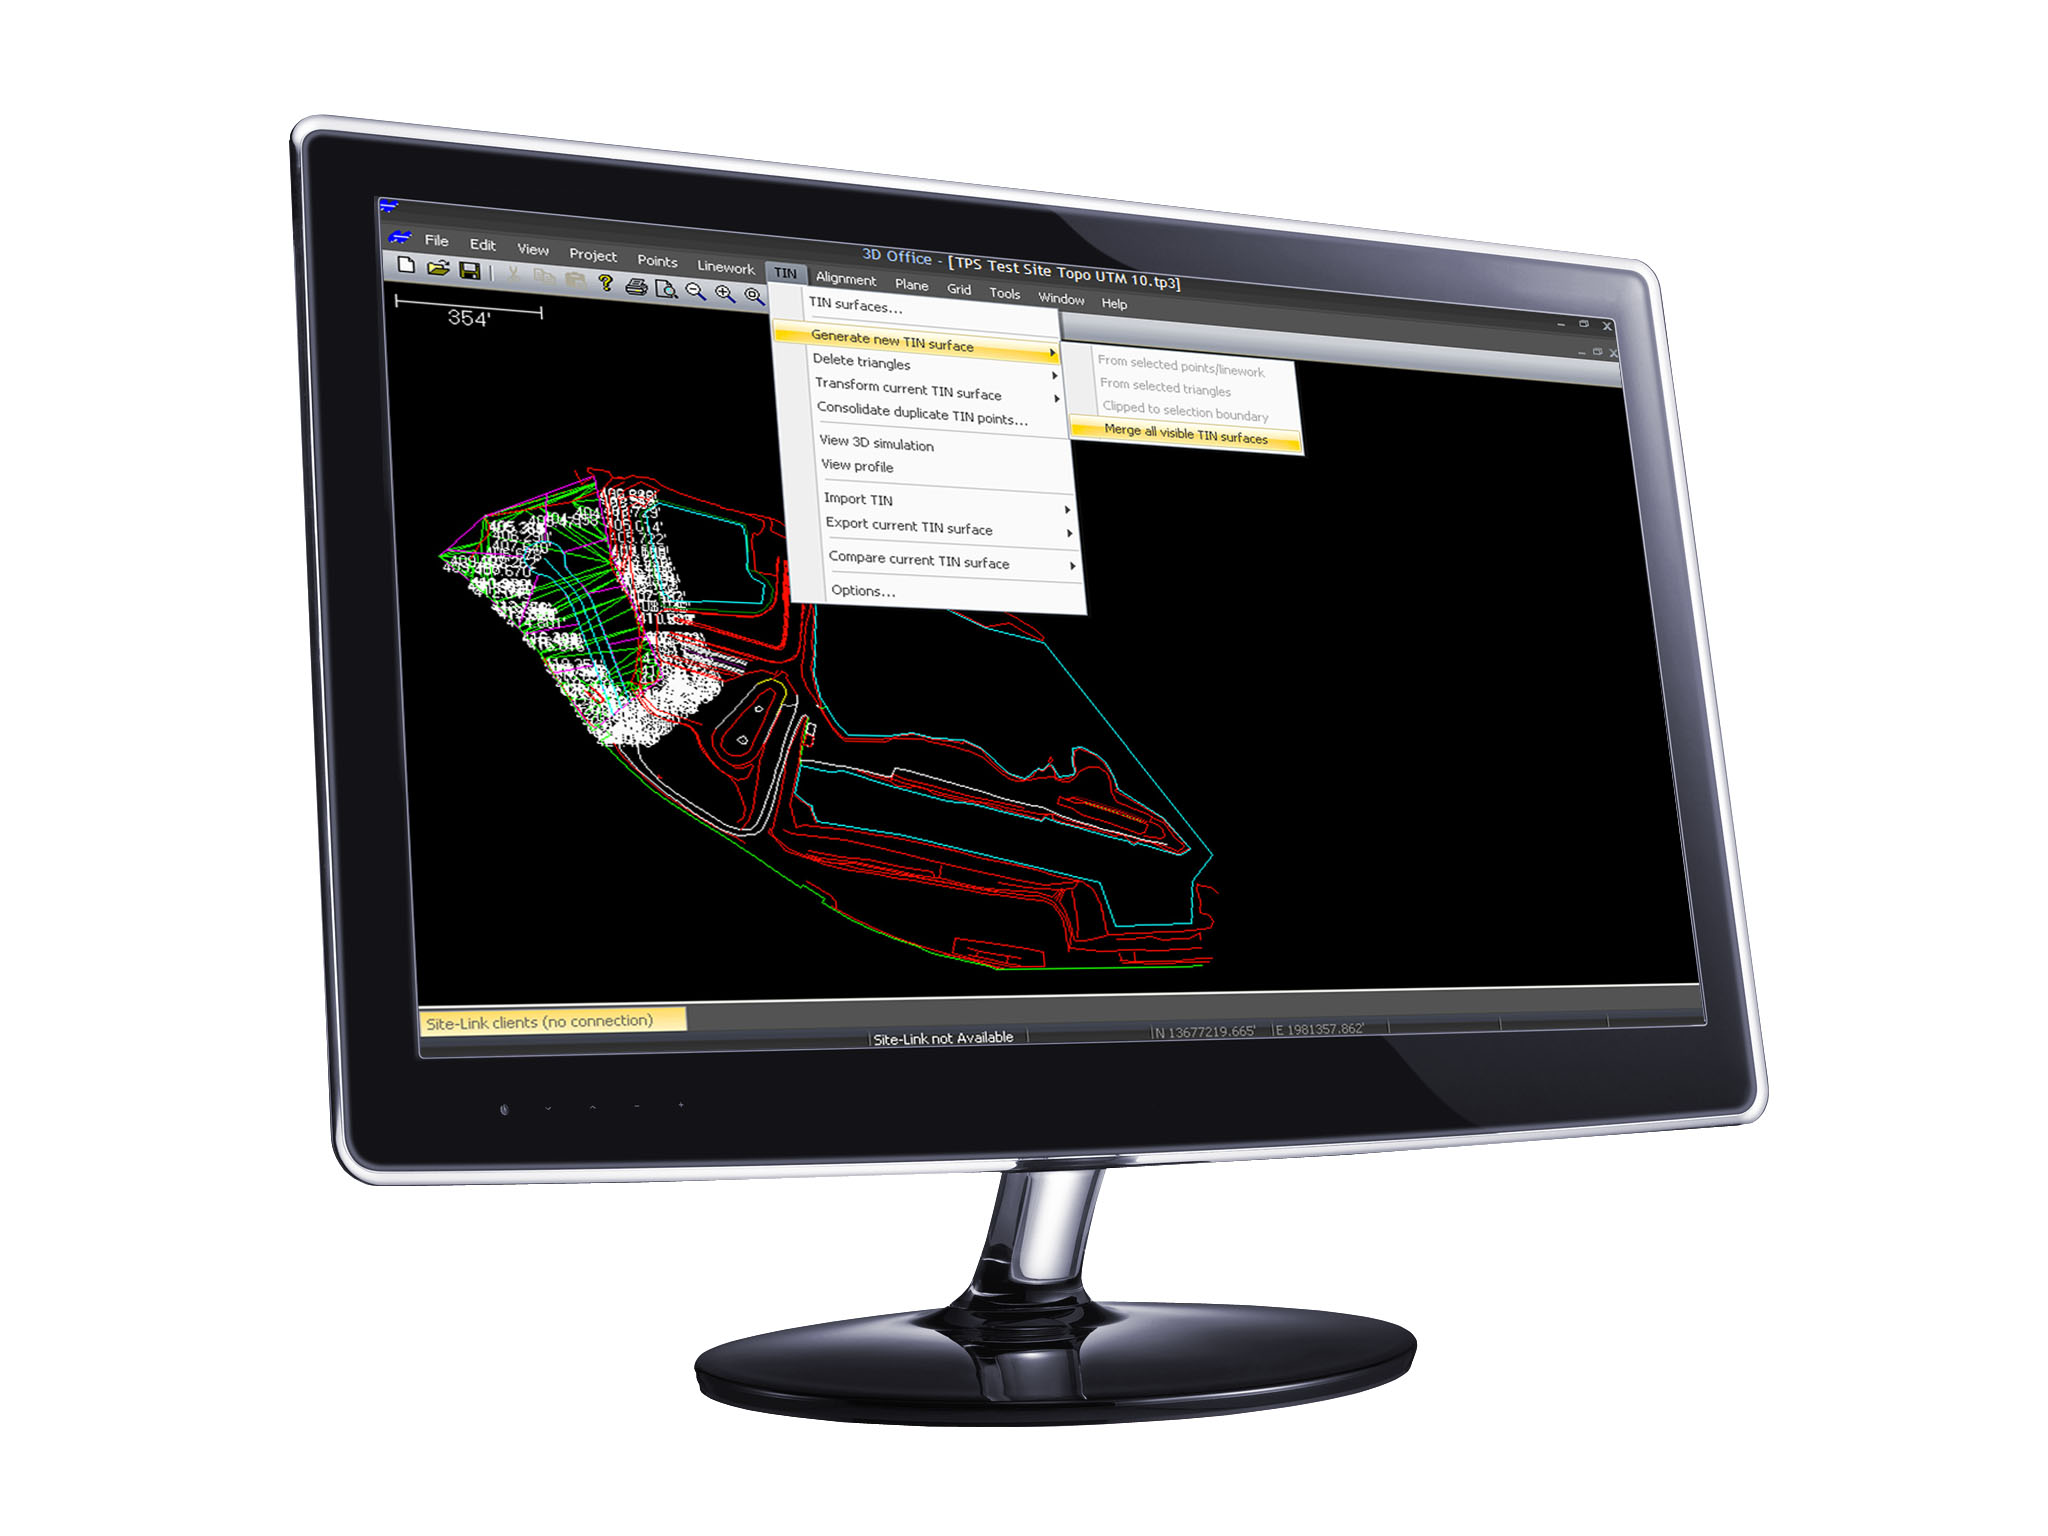 Topcon 3D-Office. Slideshow